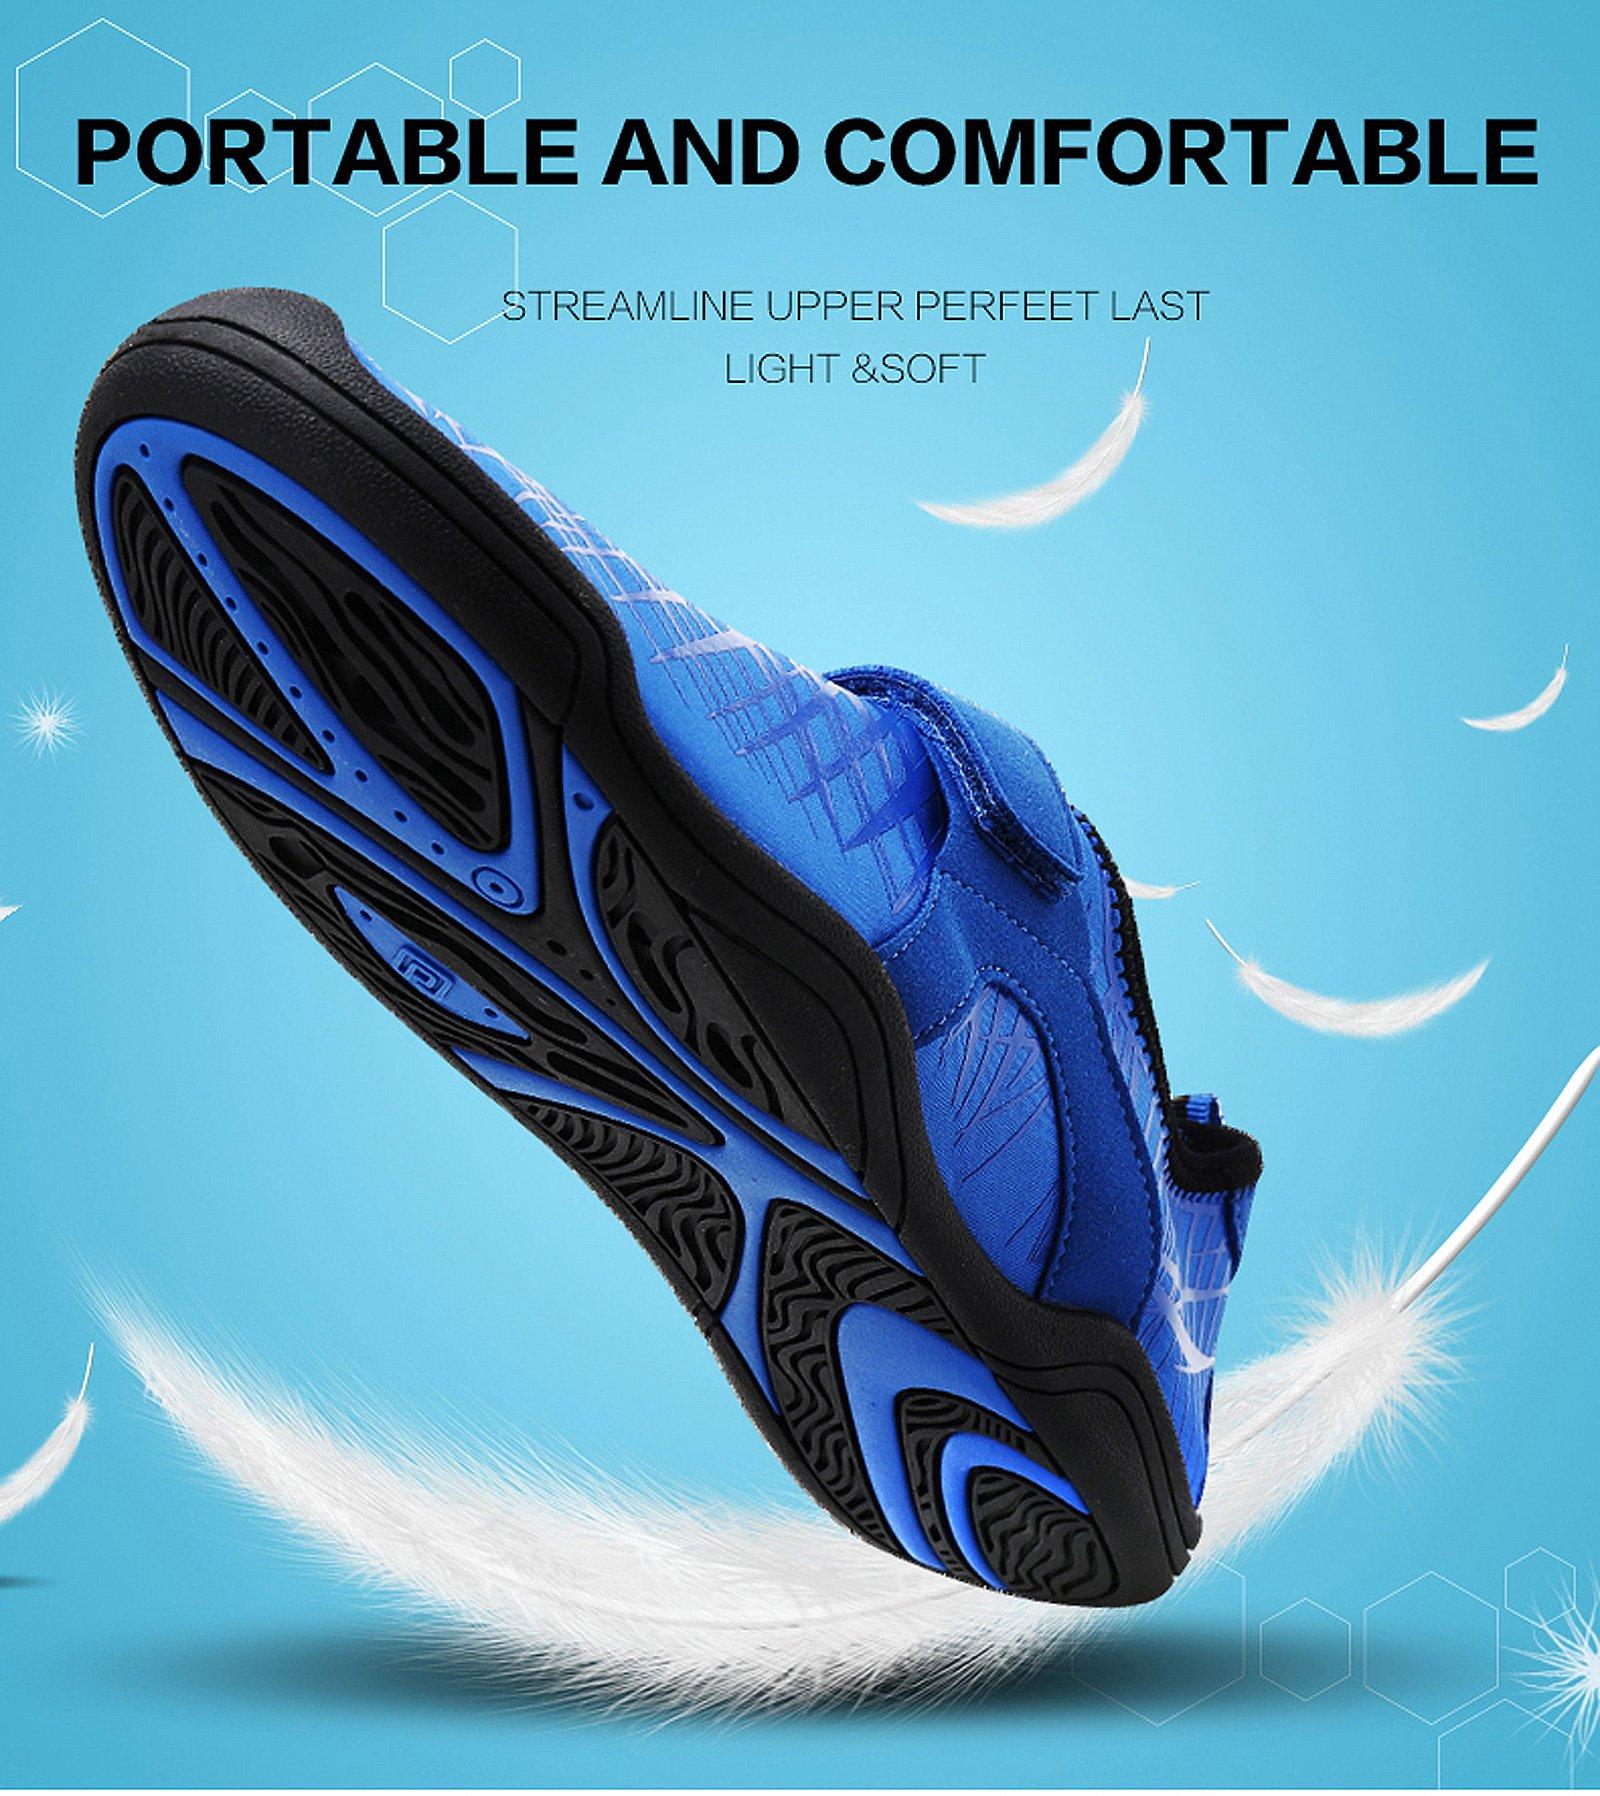 847e520488aee Men 160930-M DREAM PAIRS Men's Water Shoes Quick Dry Shoes| DREAM PAIRS